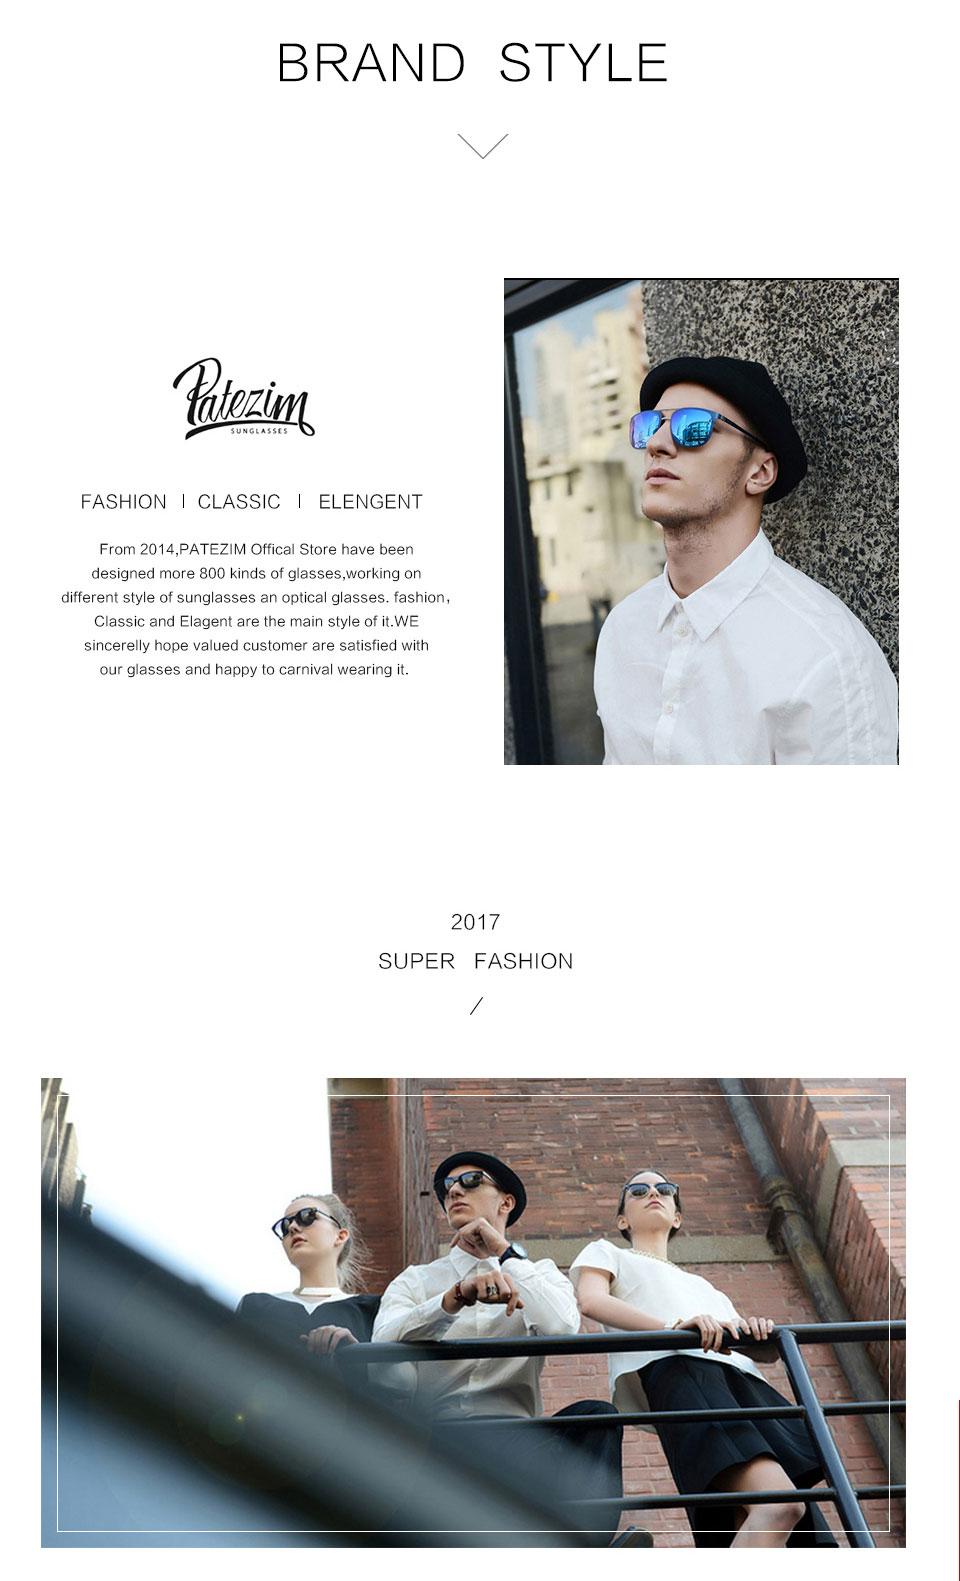 HTB1UR2GPFXXXXabaXXXq6xXFXXX9 - Cat Eye Sunglasses Women 2017 High Quality Brand Designer Vintage Fashion Driving Sun Glasses For Women UV400 lens gafas de sol